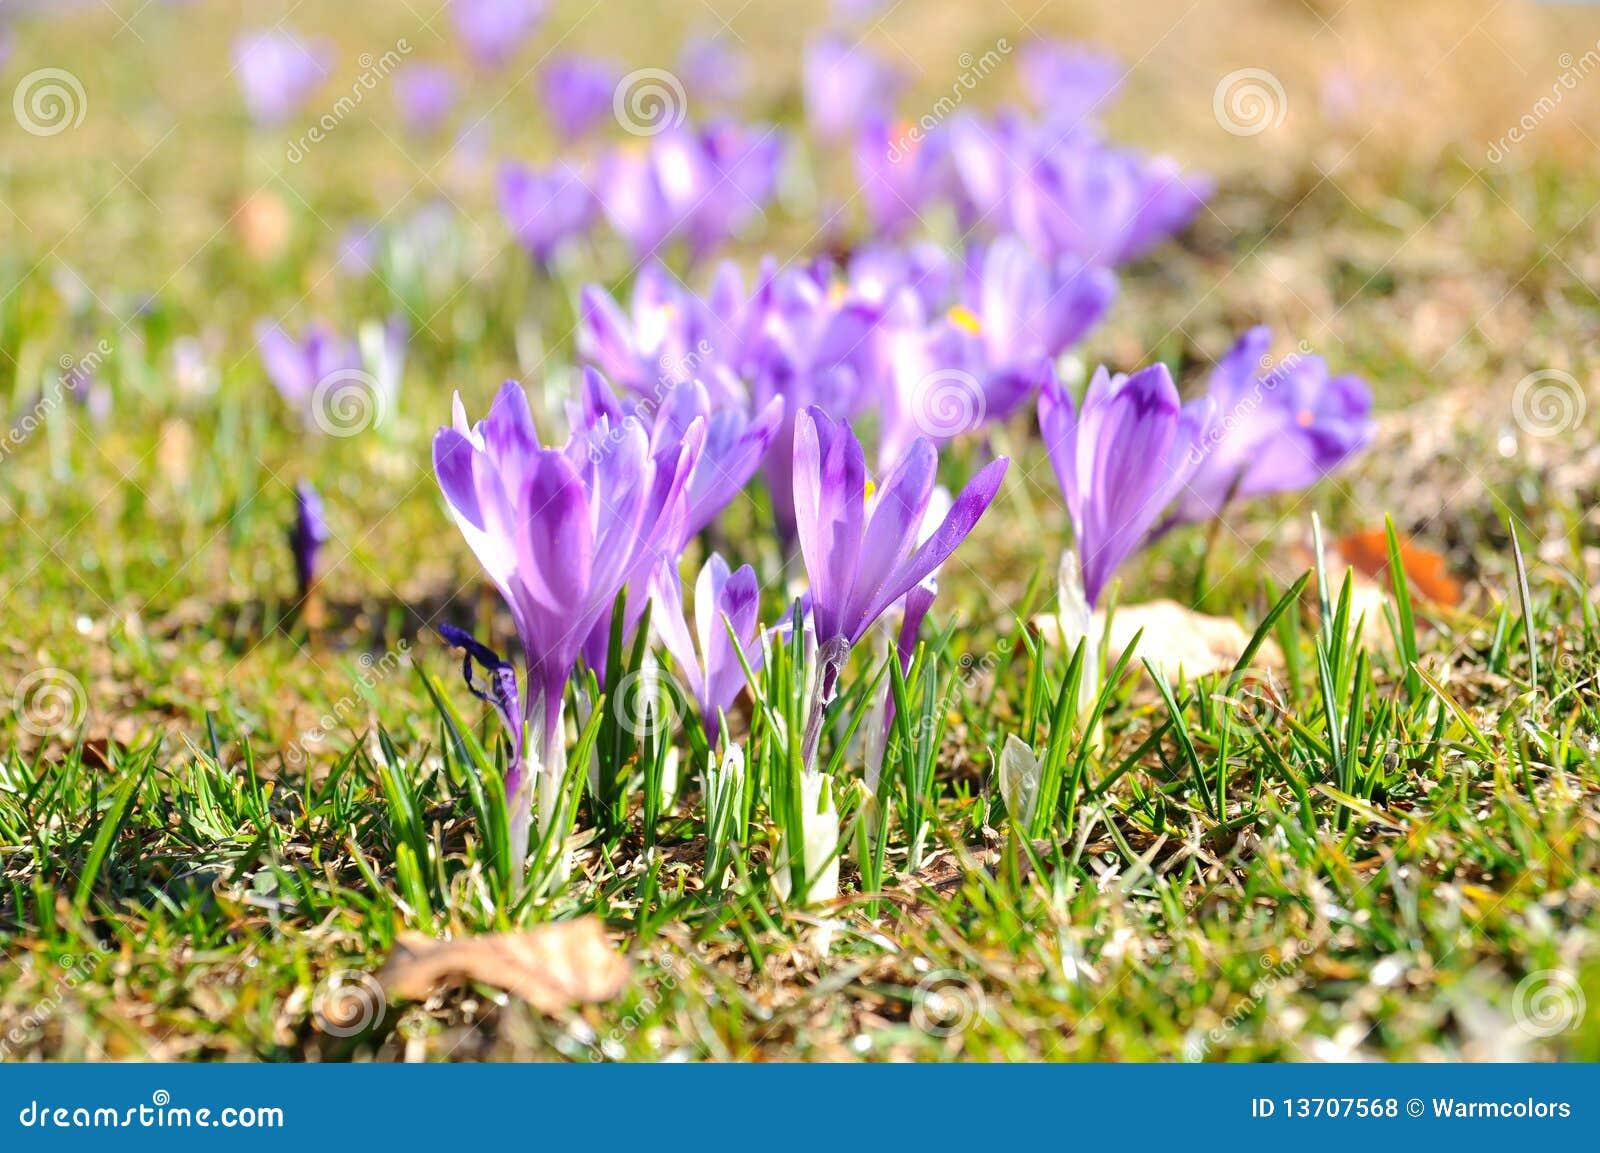 Beatifull Flowers In Spring Season Stock Photo Image Of Perfume